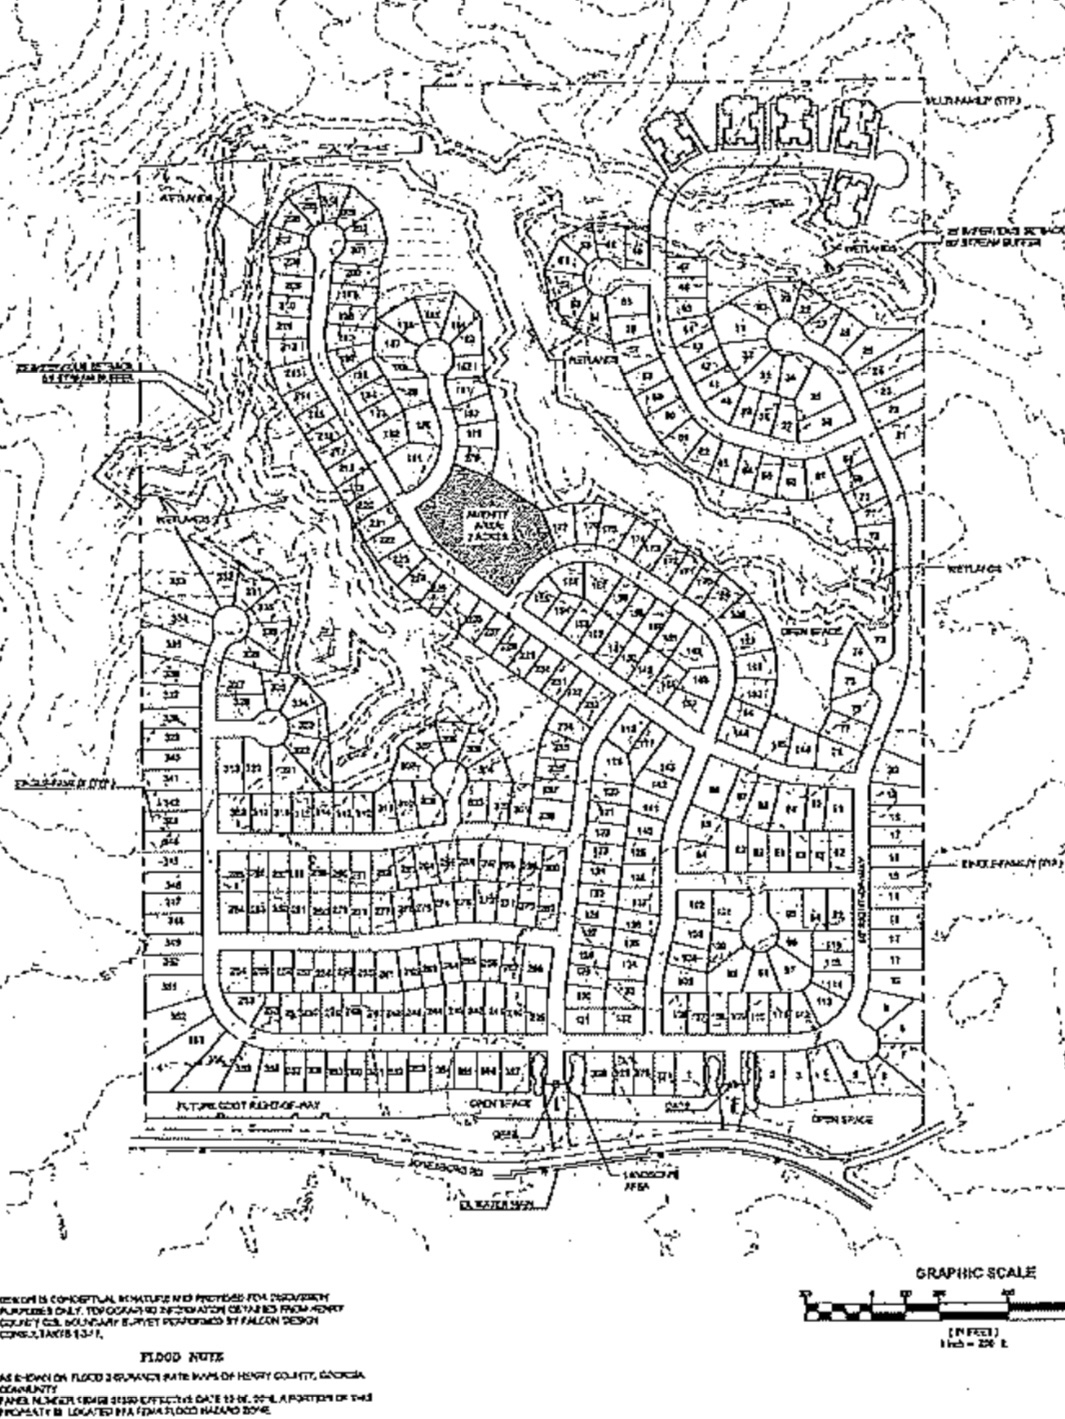 Concept site plan for Hybrass Properties development on Jonesboro Road